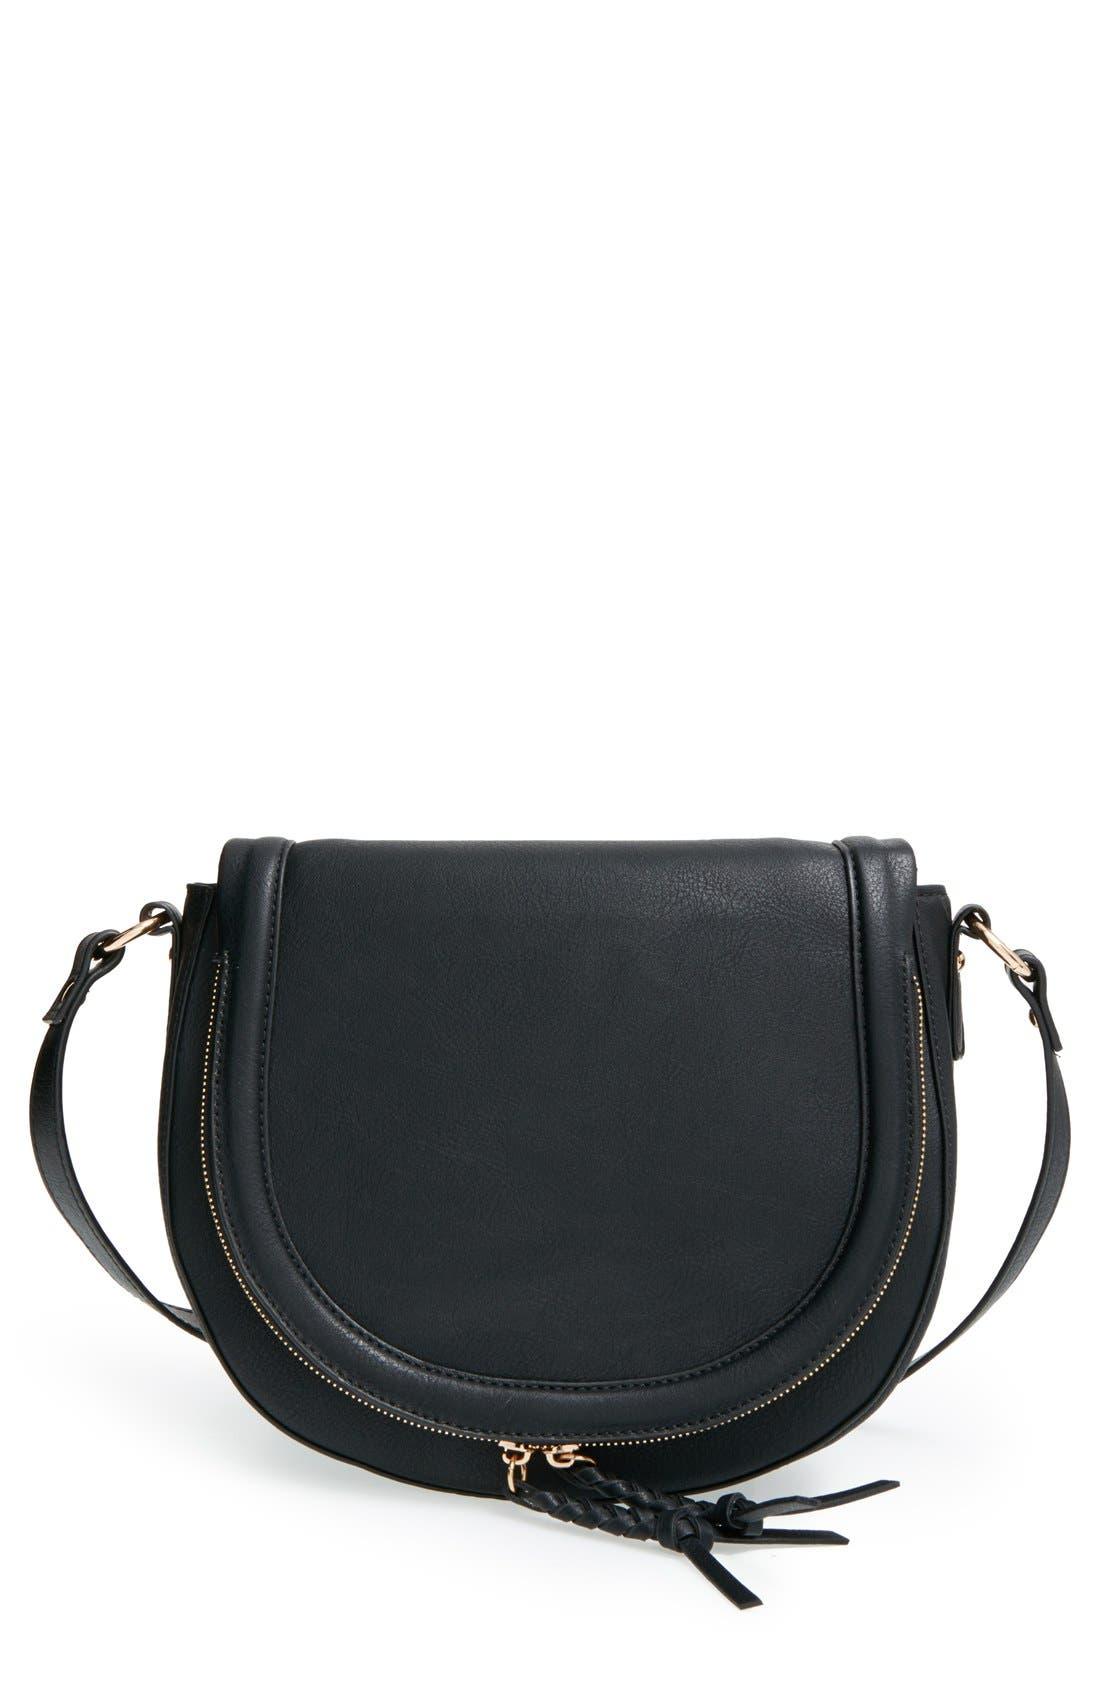 Alternate Image 1 Selected - Sole Society 'Thalia'Crossbody Bag